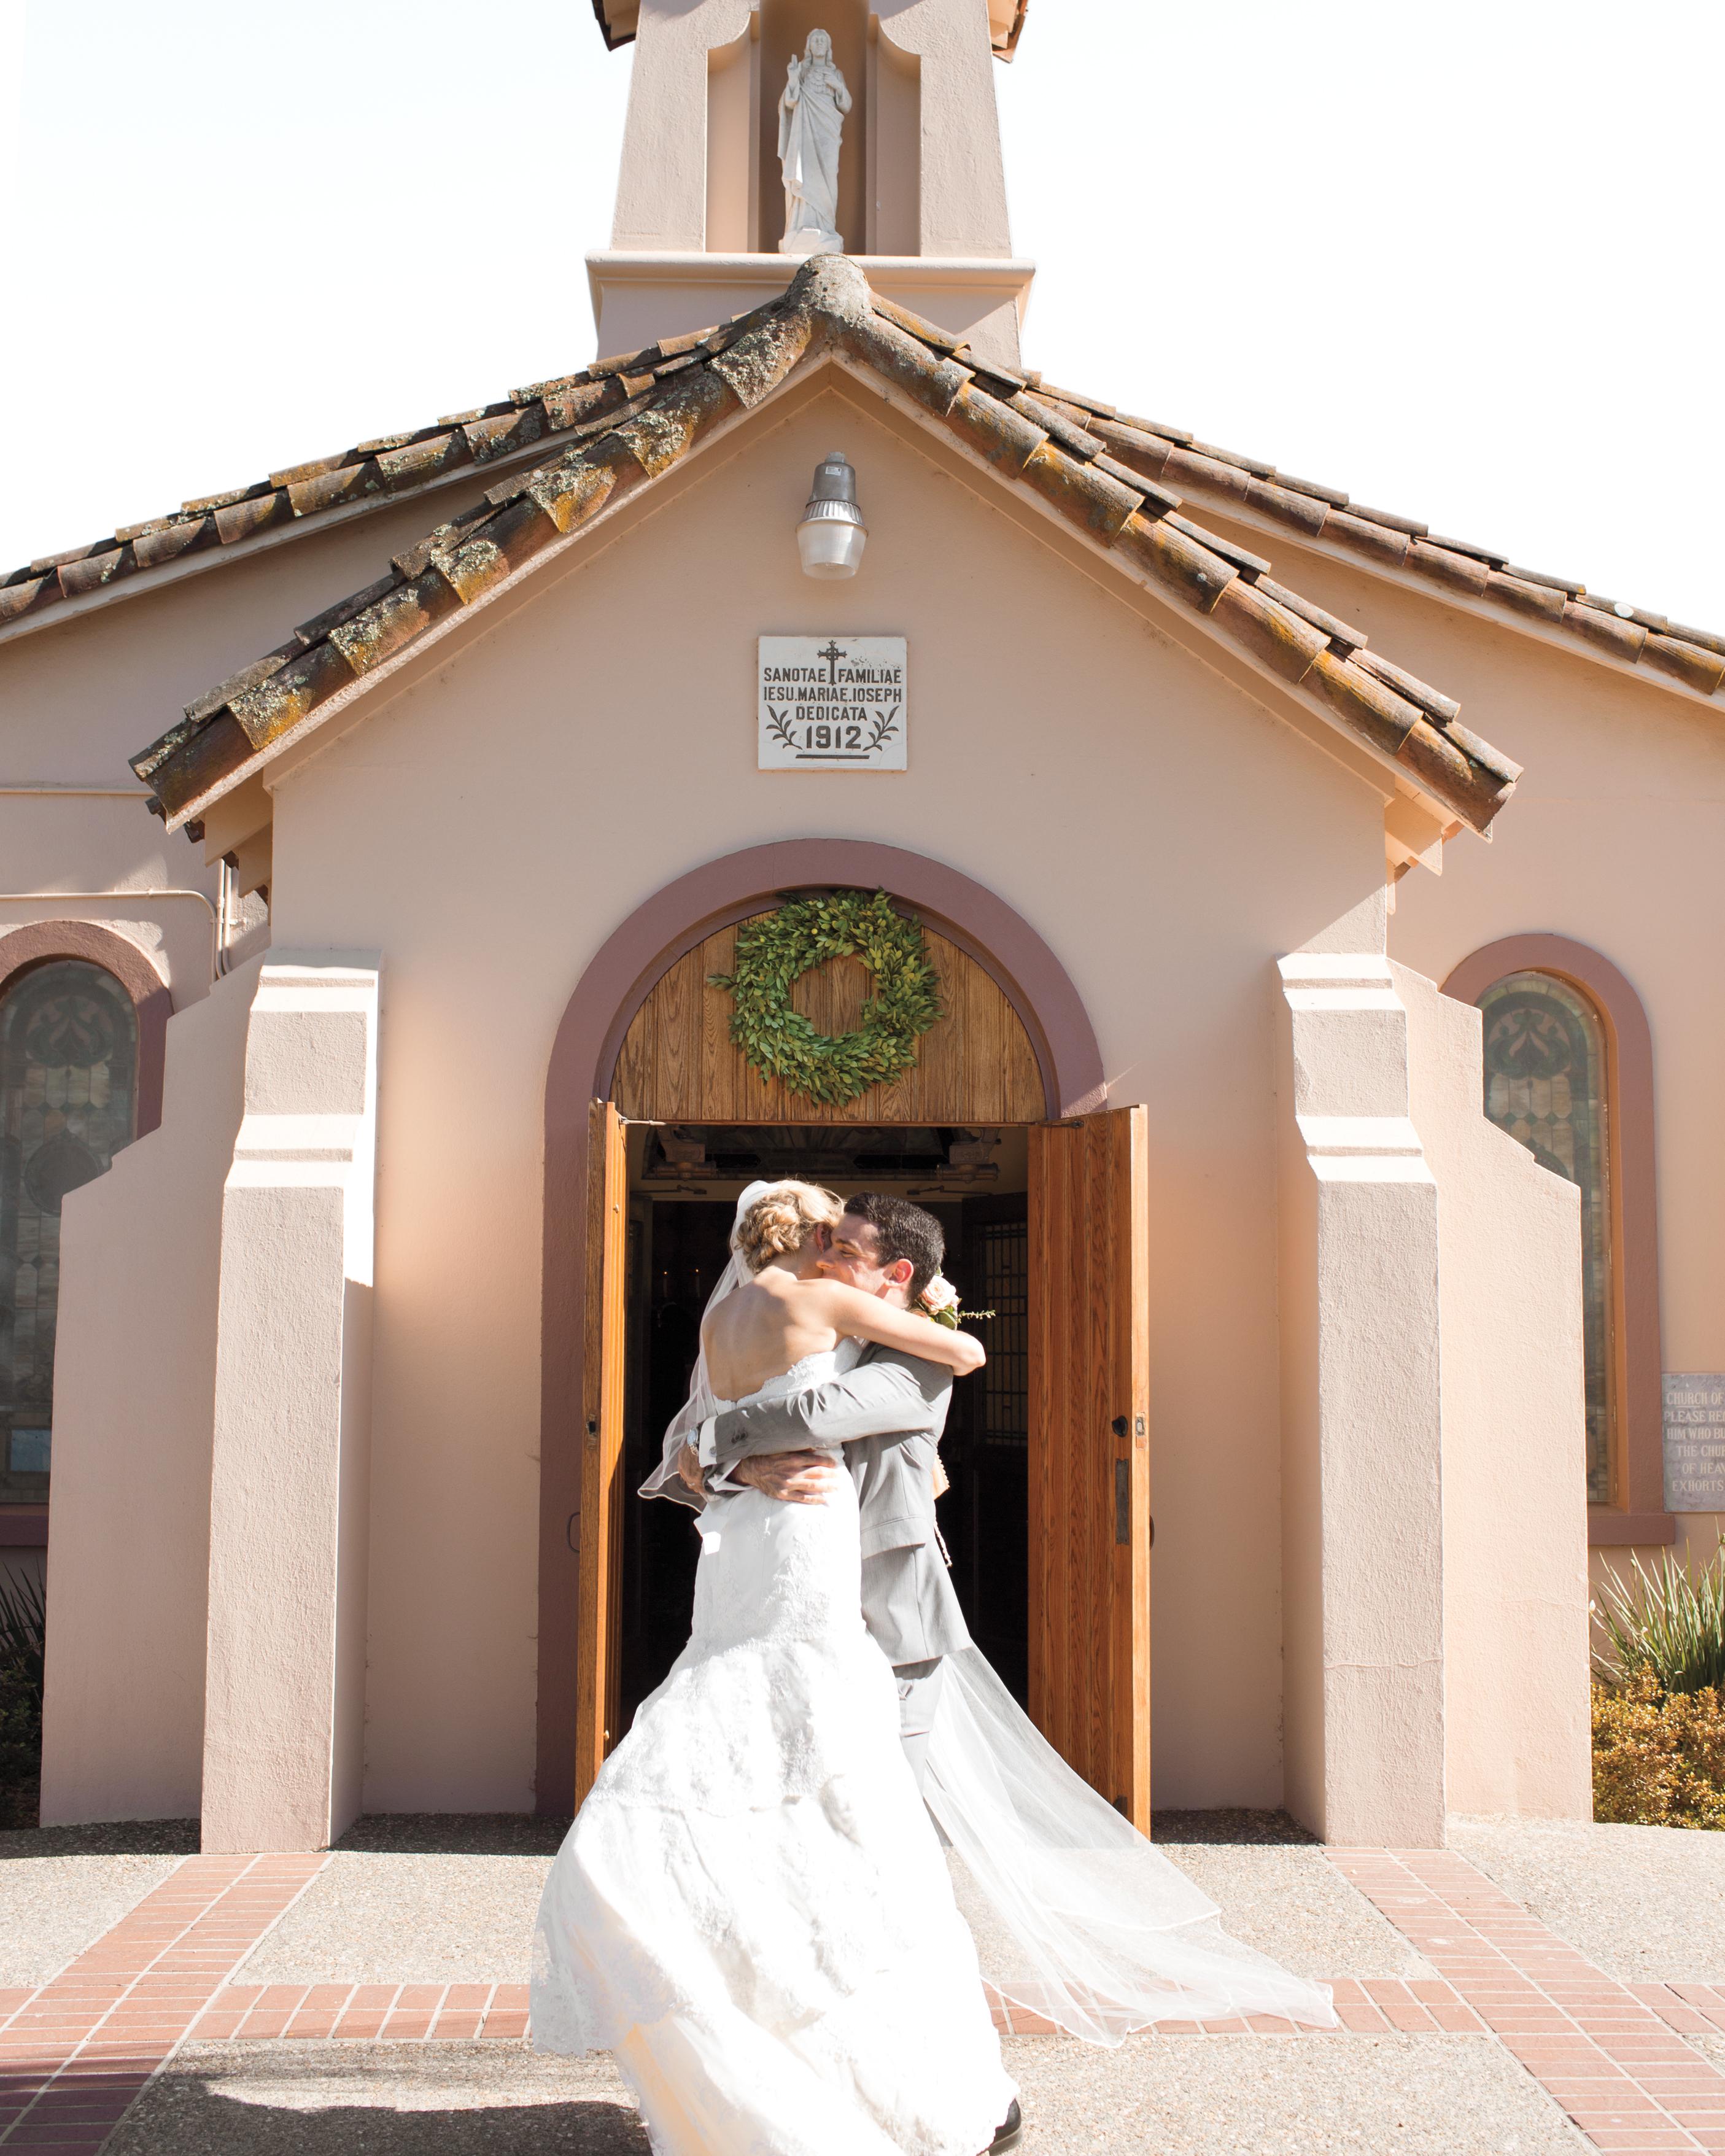 bride-groom-church-portraits-0006-mwd110175.jpg